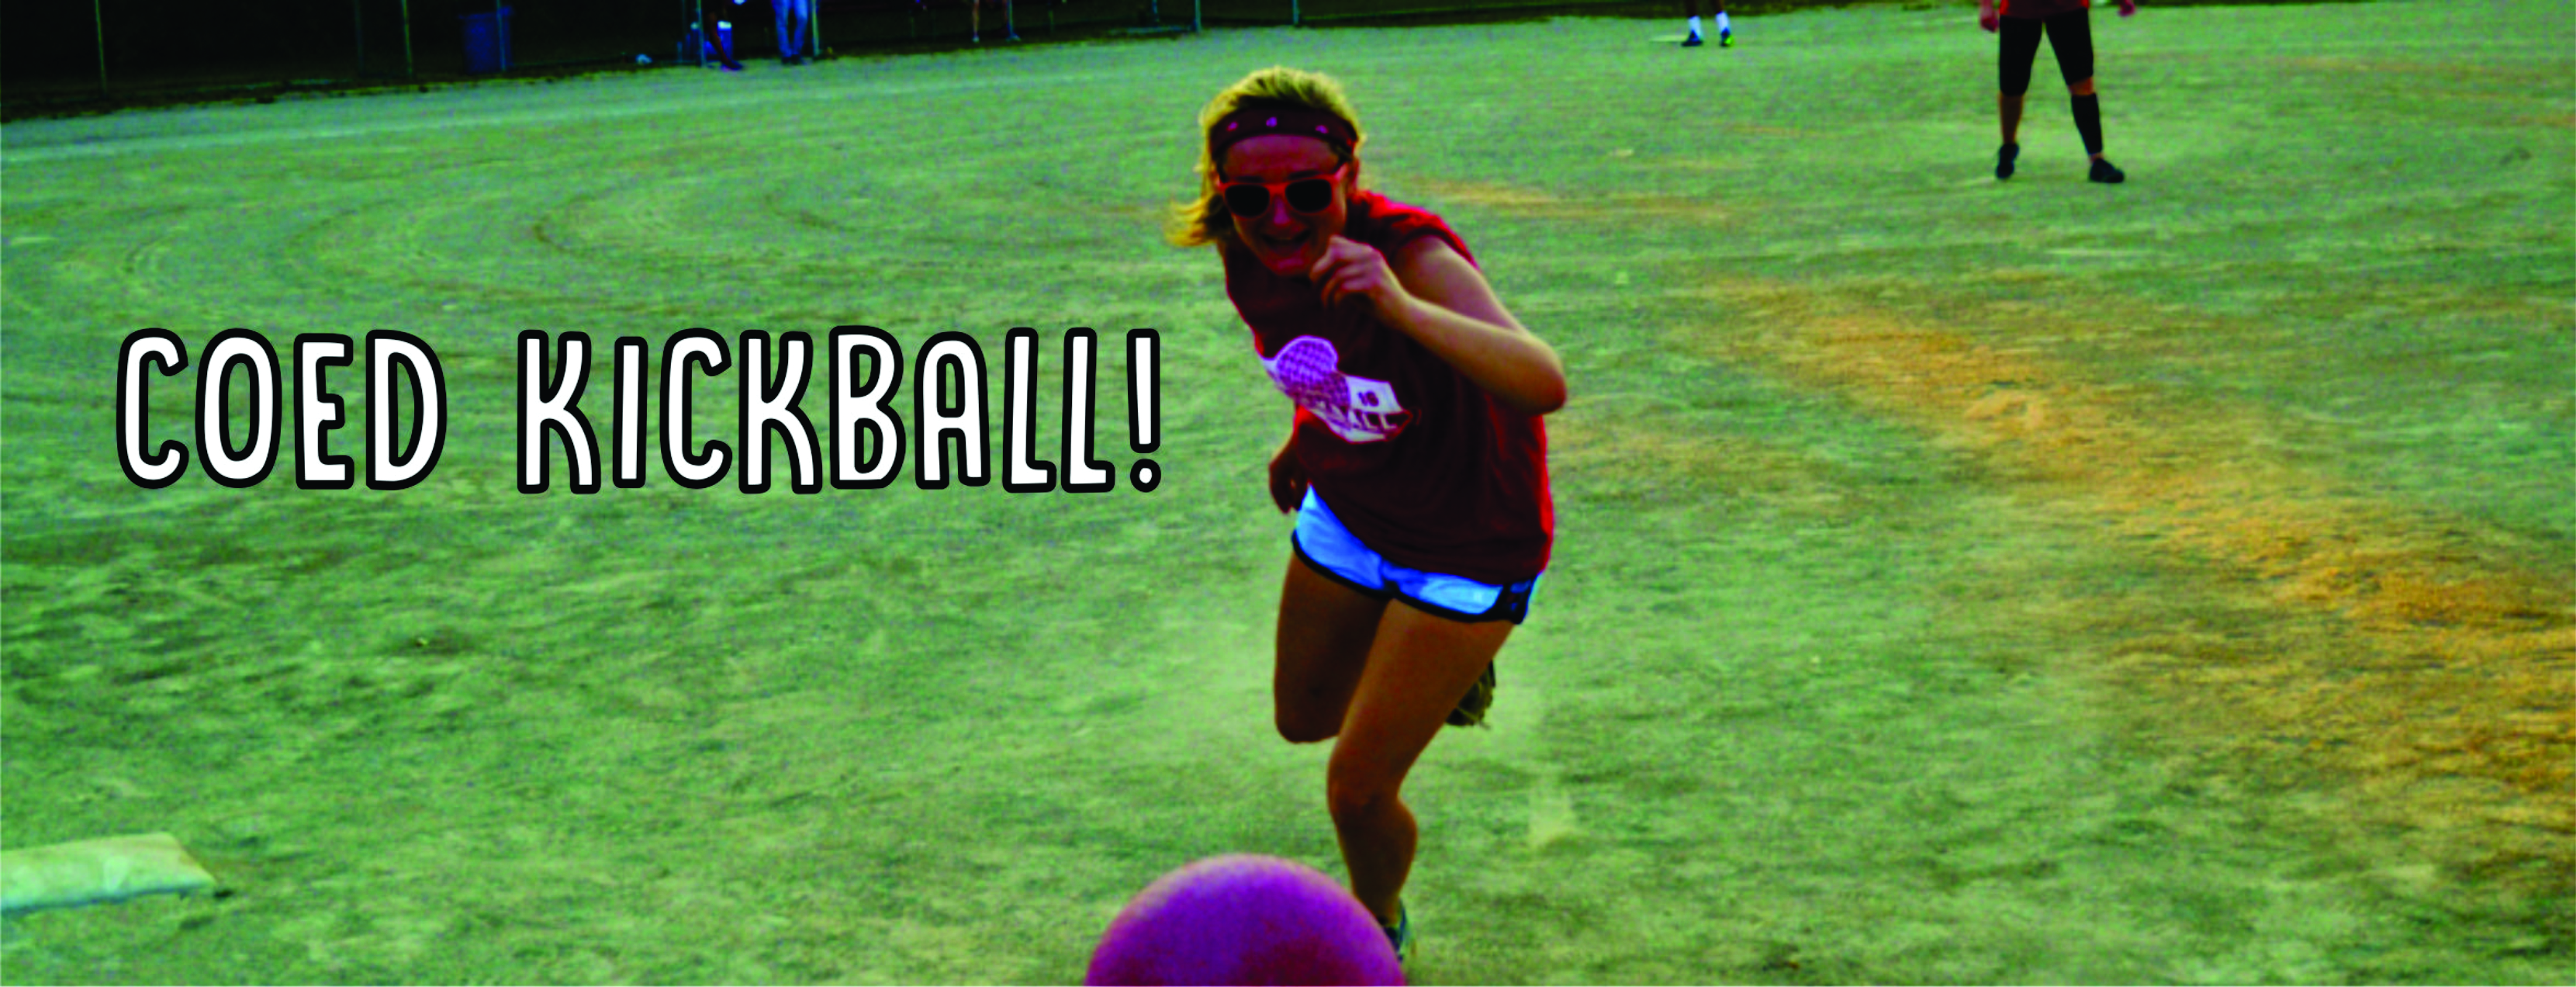 Coed Kickball